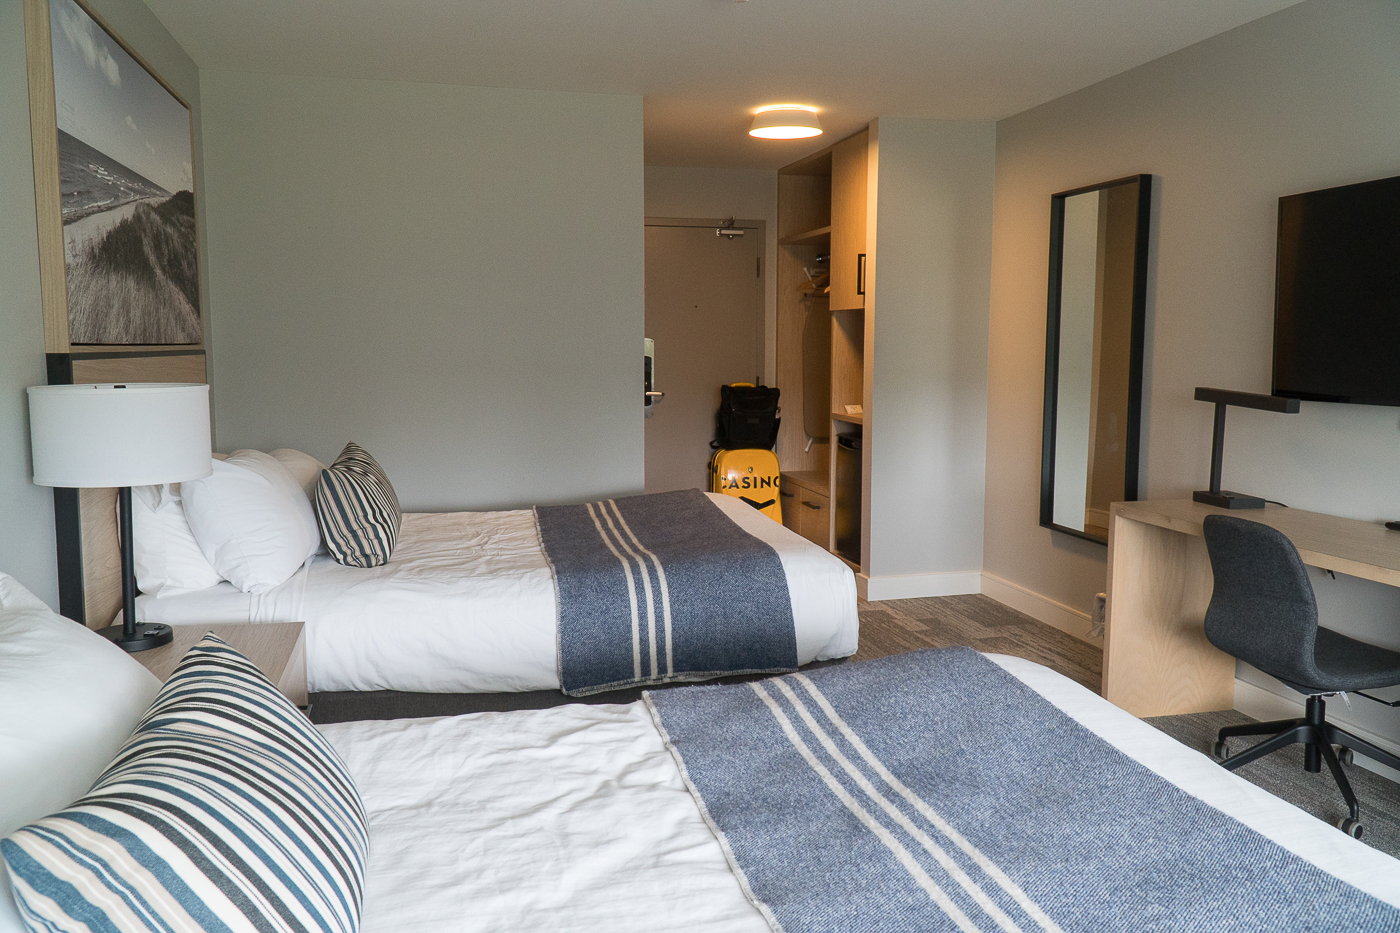 Chambre double au MIll River Resort